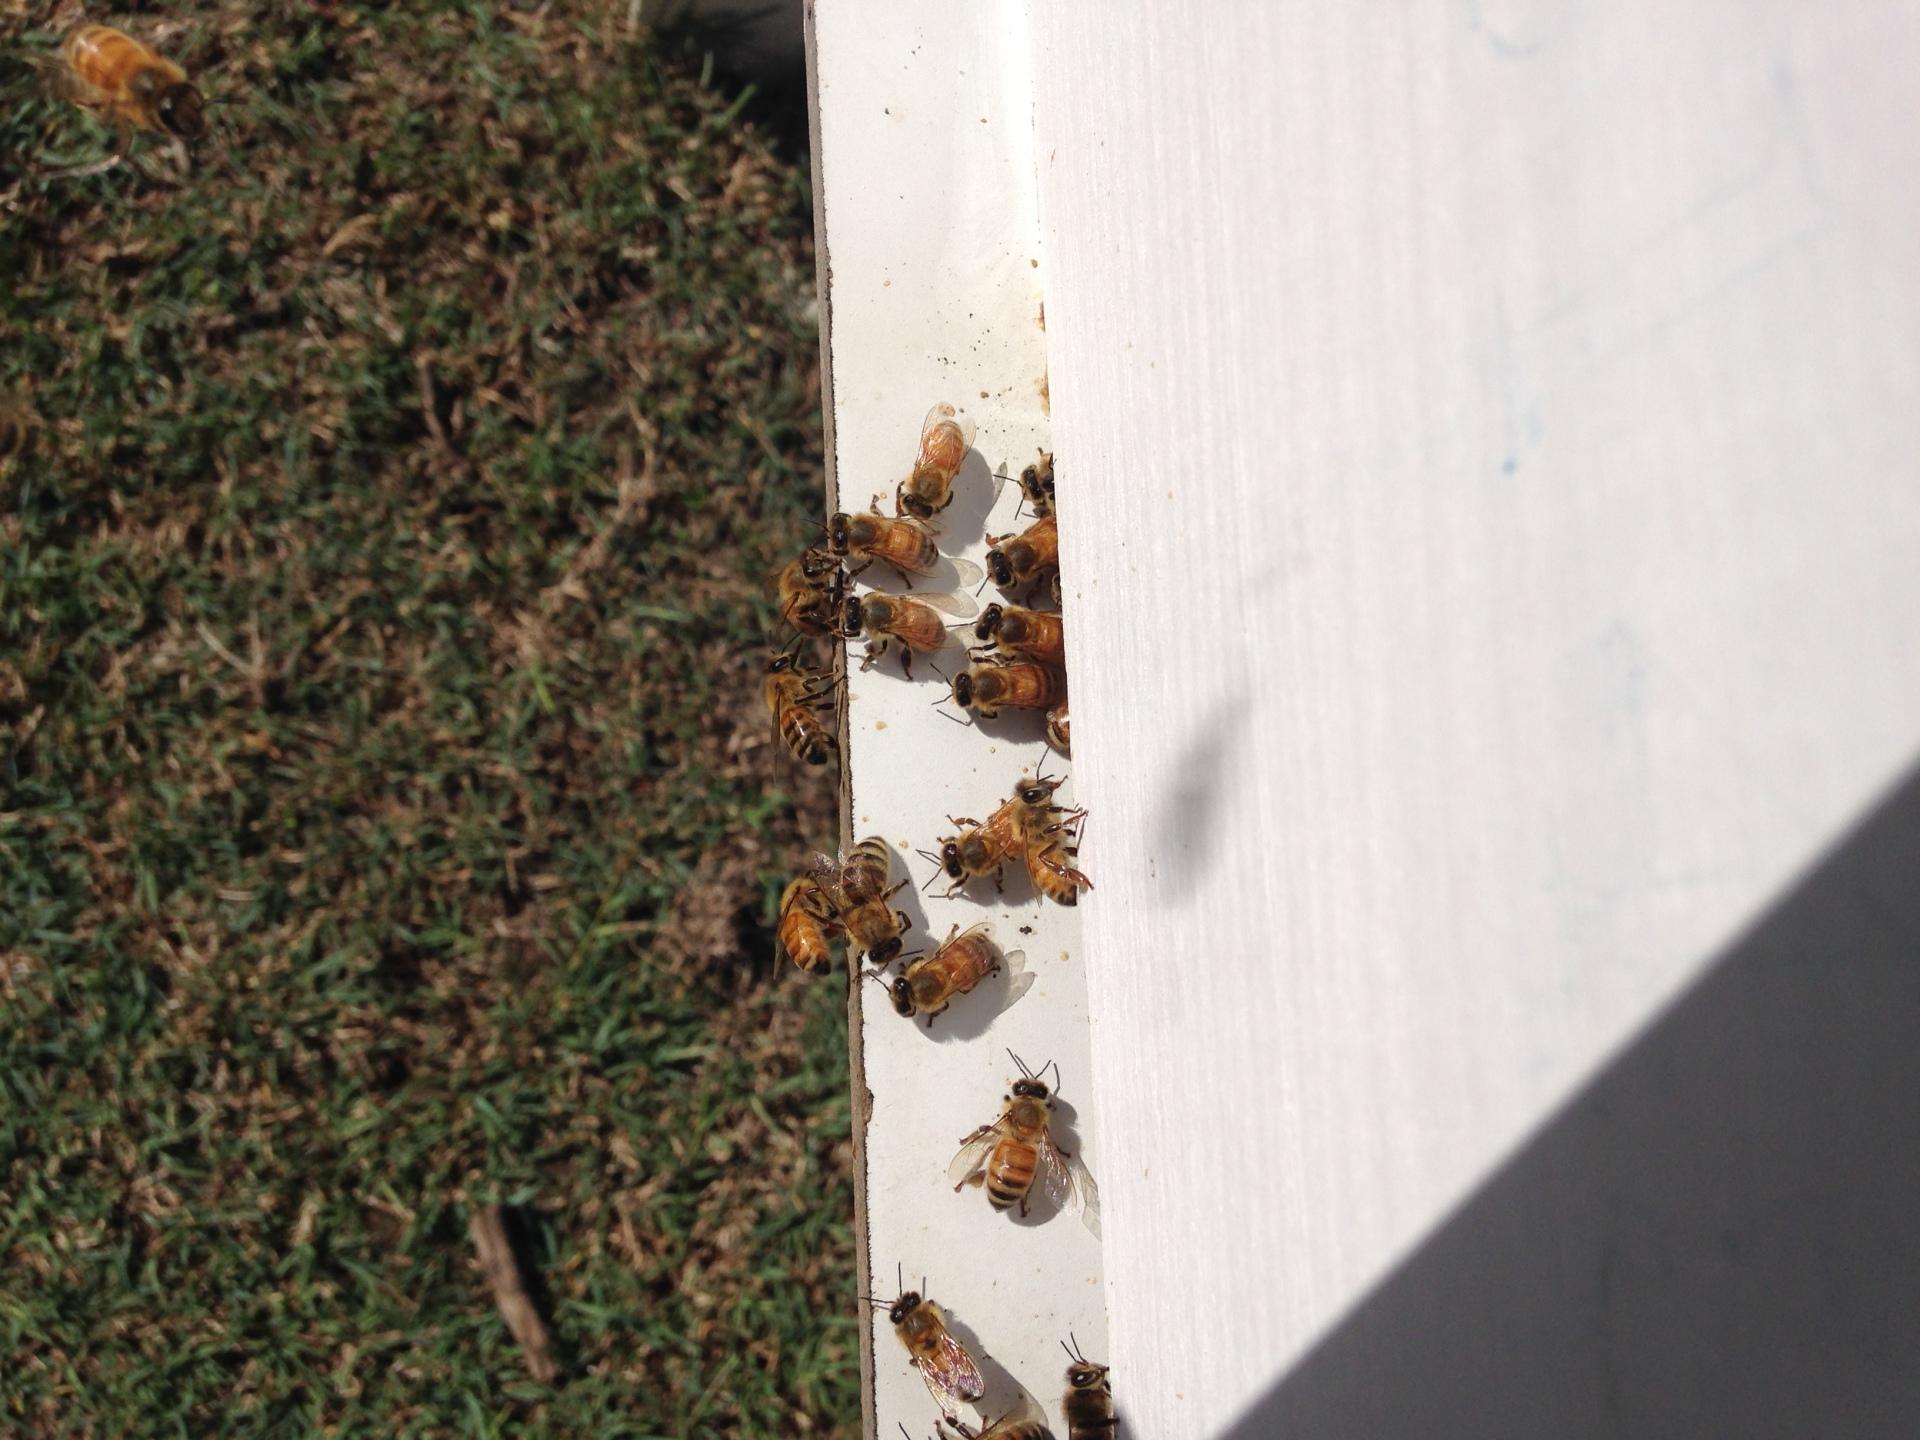 Bees Honey HoneyWorks queensland hive